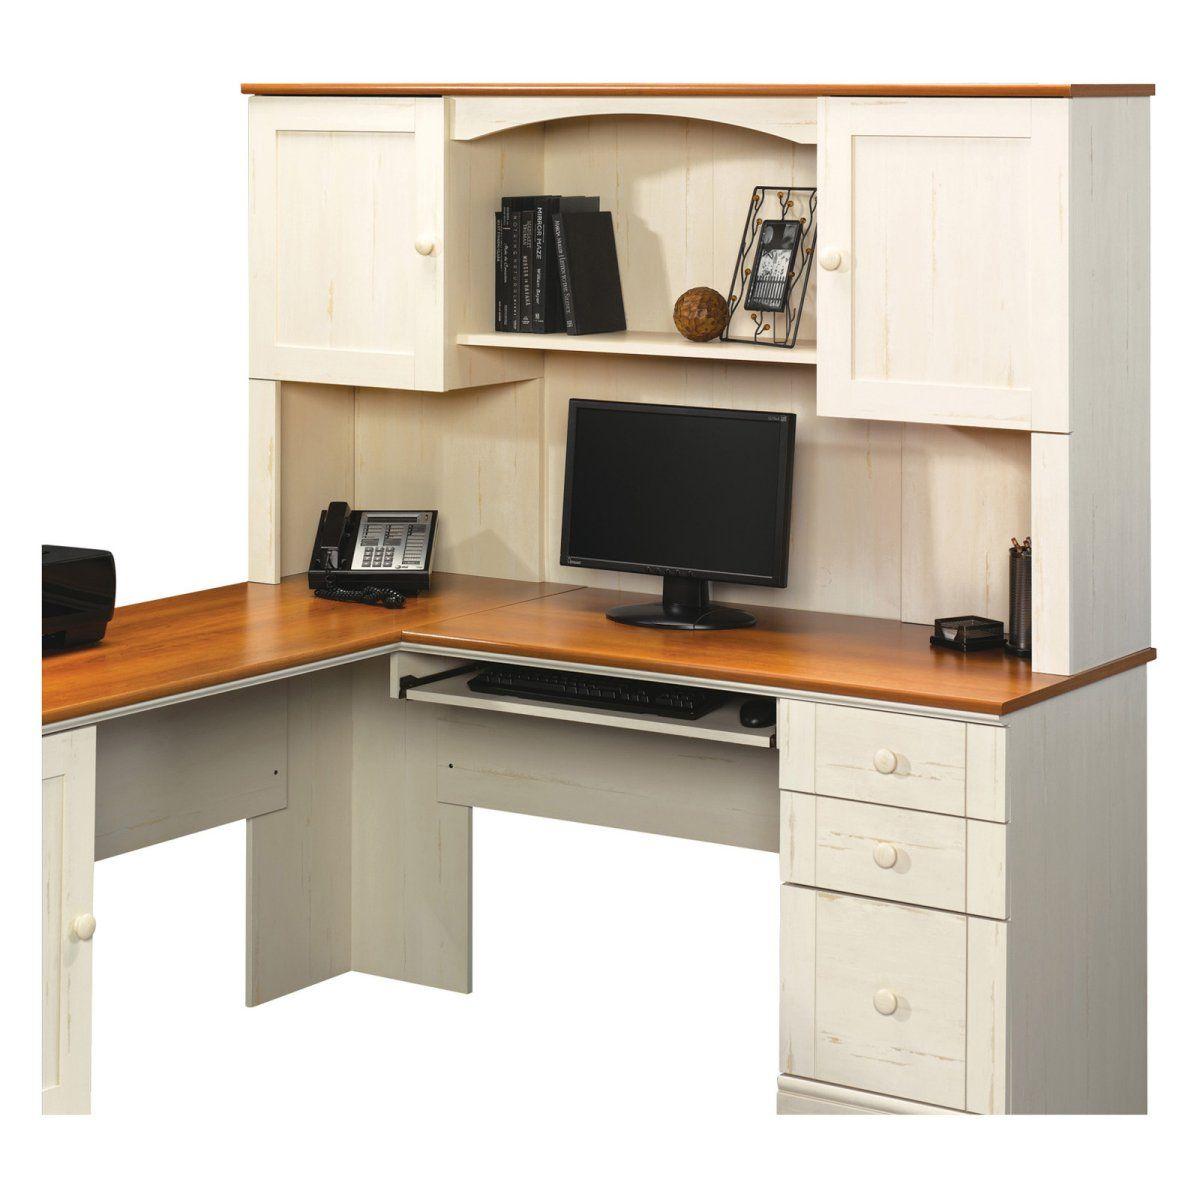 Sauder Harbor View Corner Computer Desk with Hutch - Antiqued White - Desk  and Hutch Sets - Sauder Harbor View Corner Computer Desk With Hutch - Antiqued White